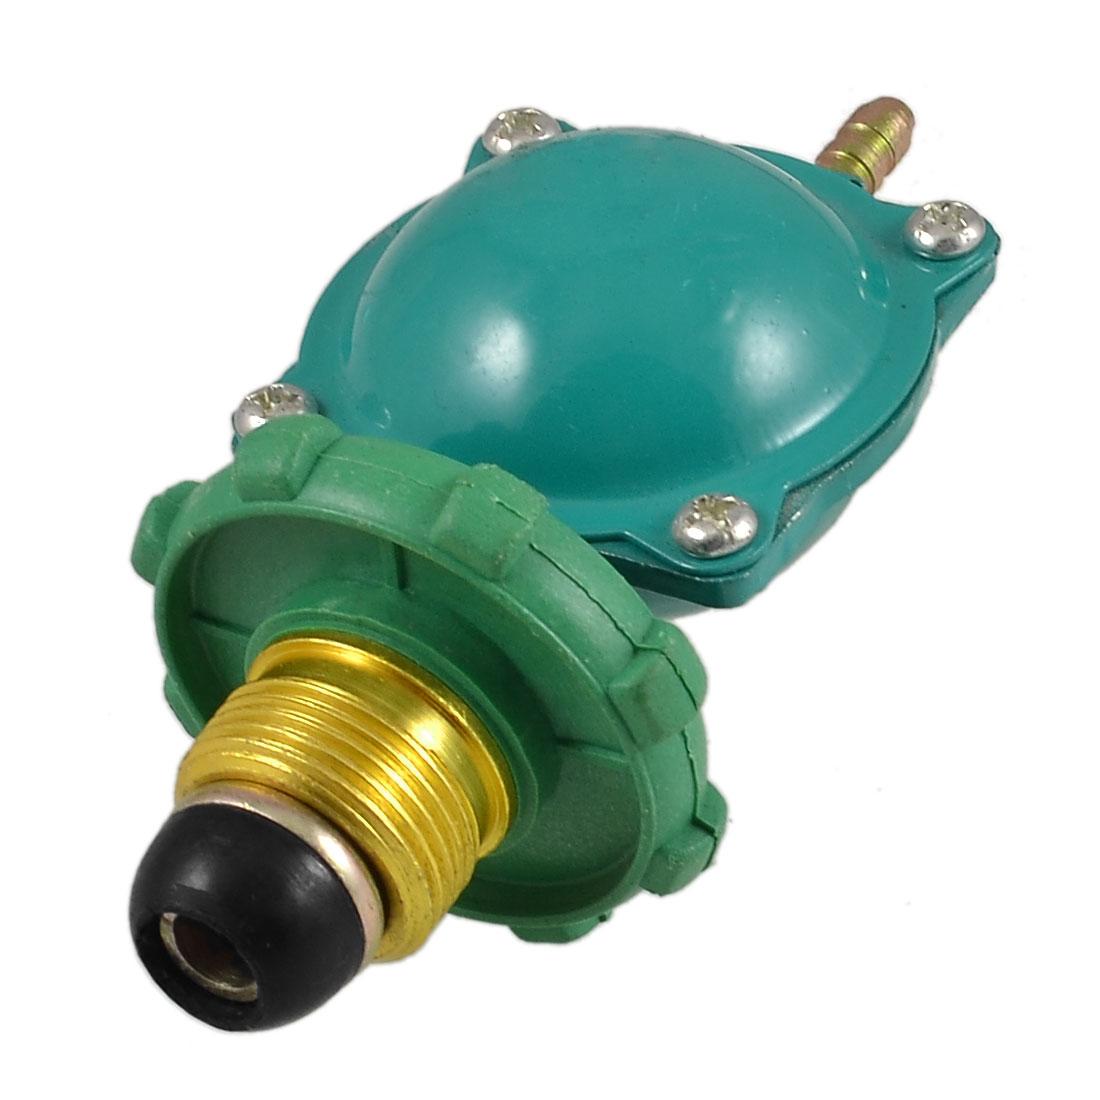 Green 22mm Thread Household Bottled Compressed Gas Pressure Regulator Valve